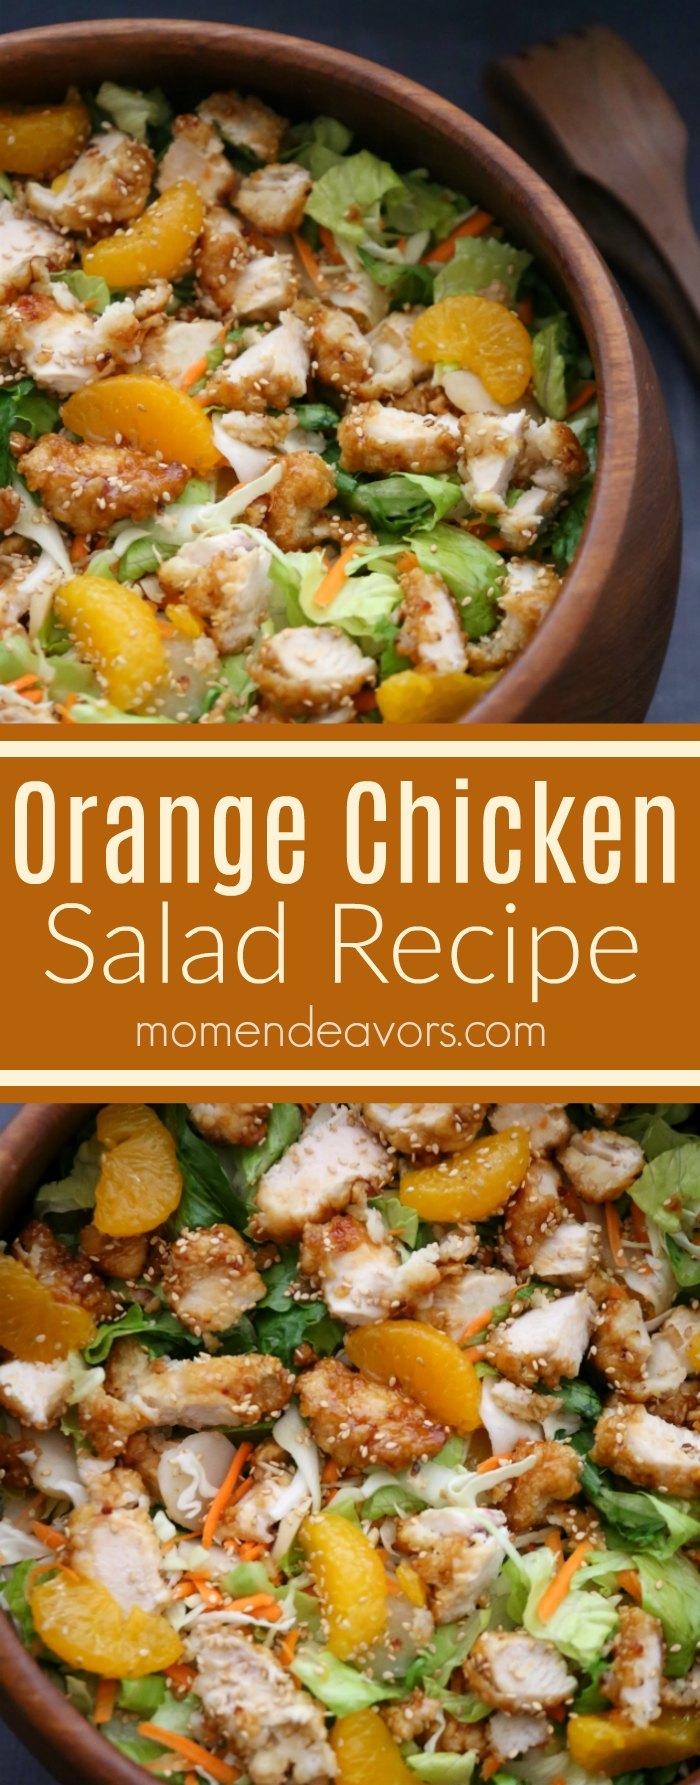 Easy Orange Chicken Salad Recipe